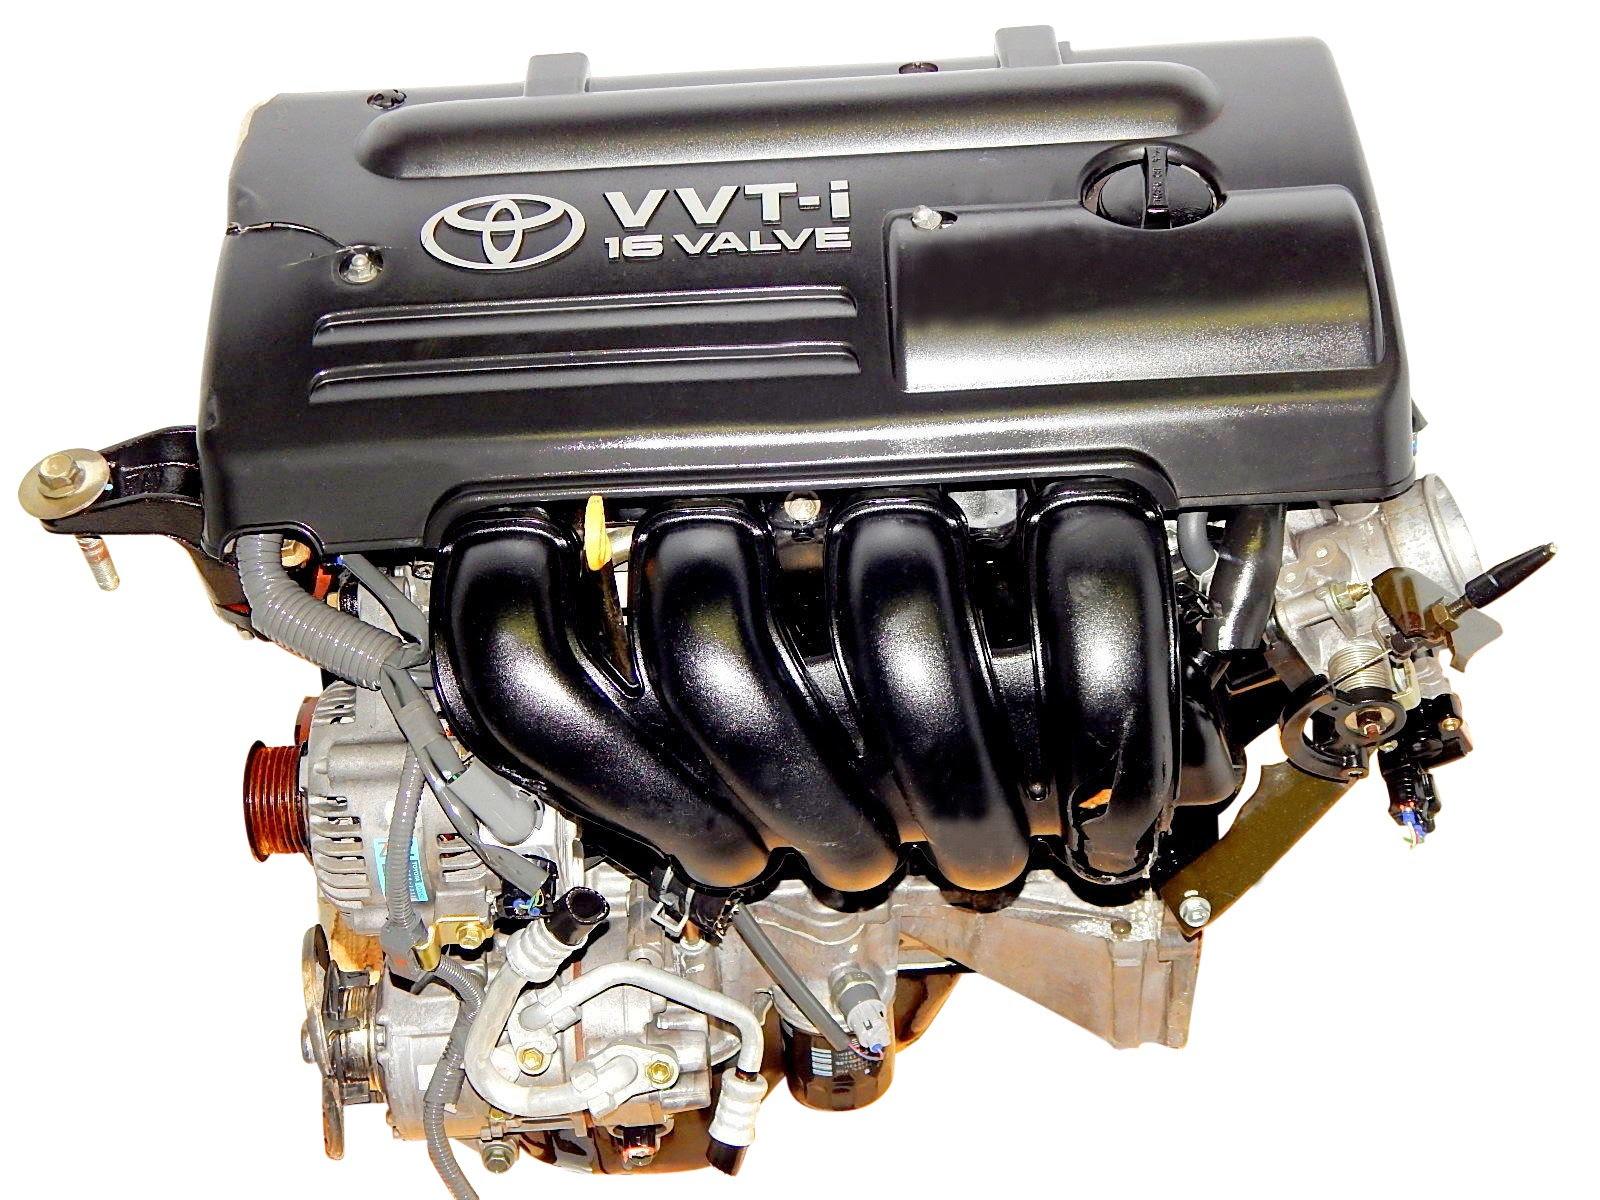 Bestseller: 2002 Toyota Celica Gt Engine Diagram